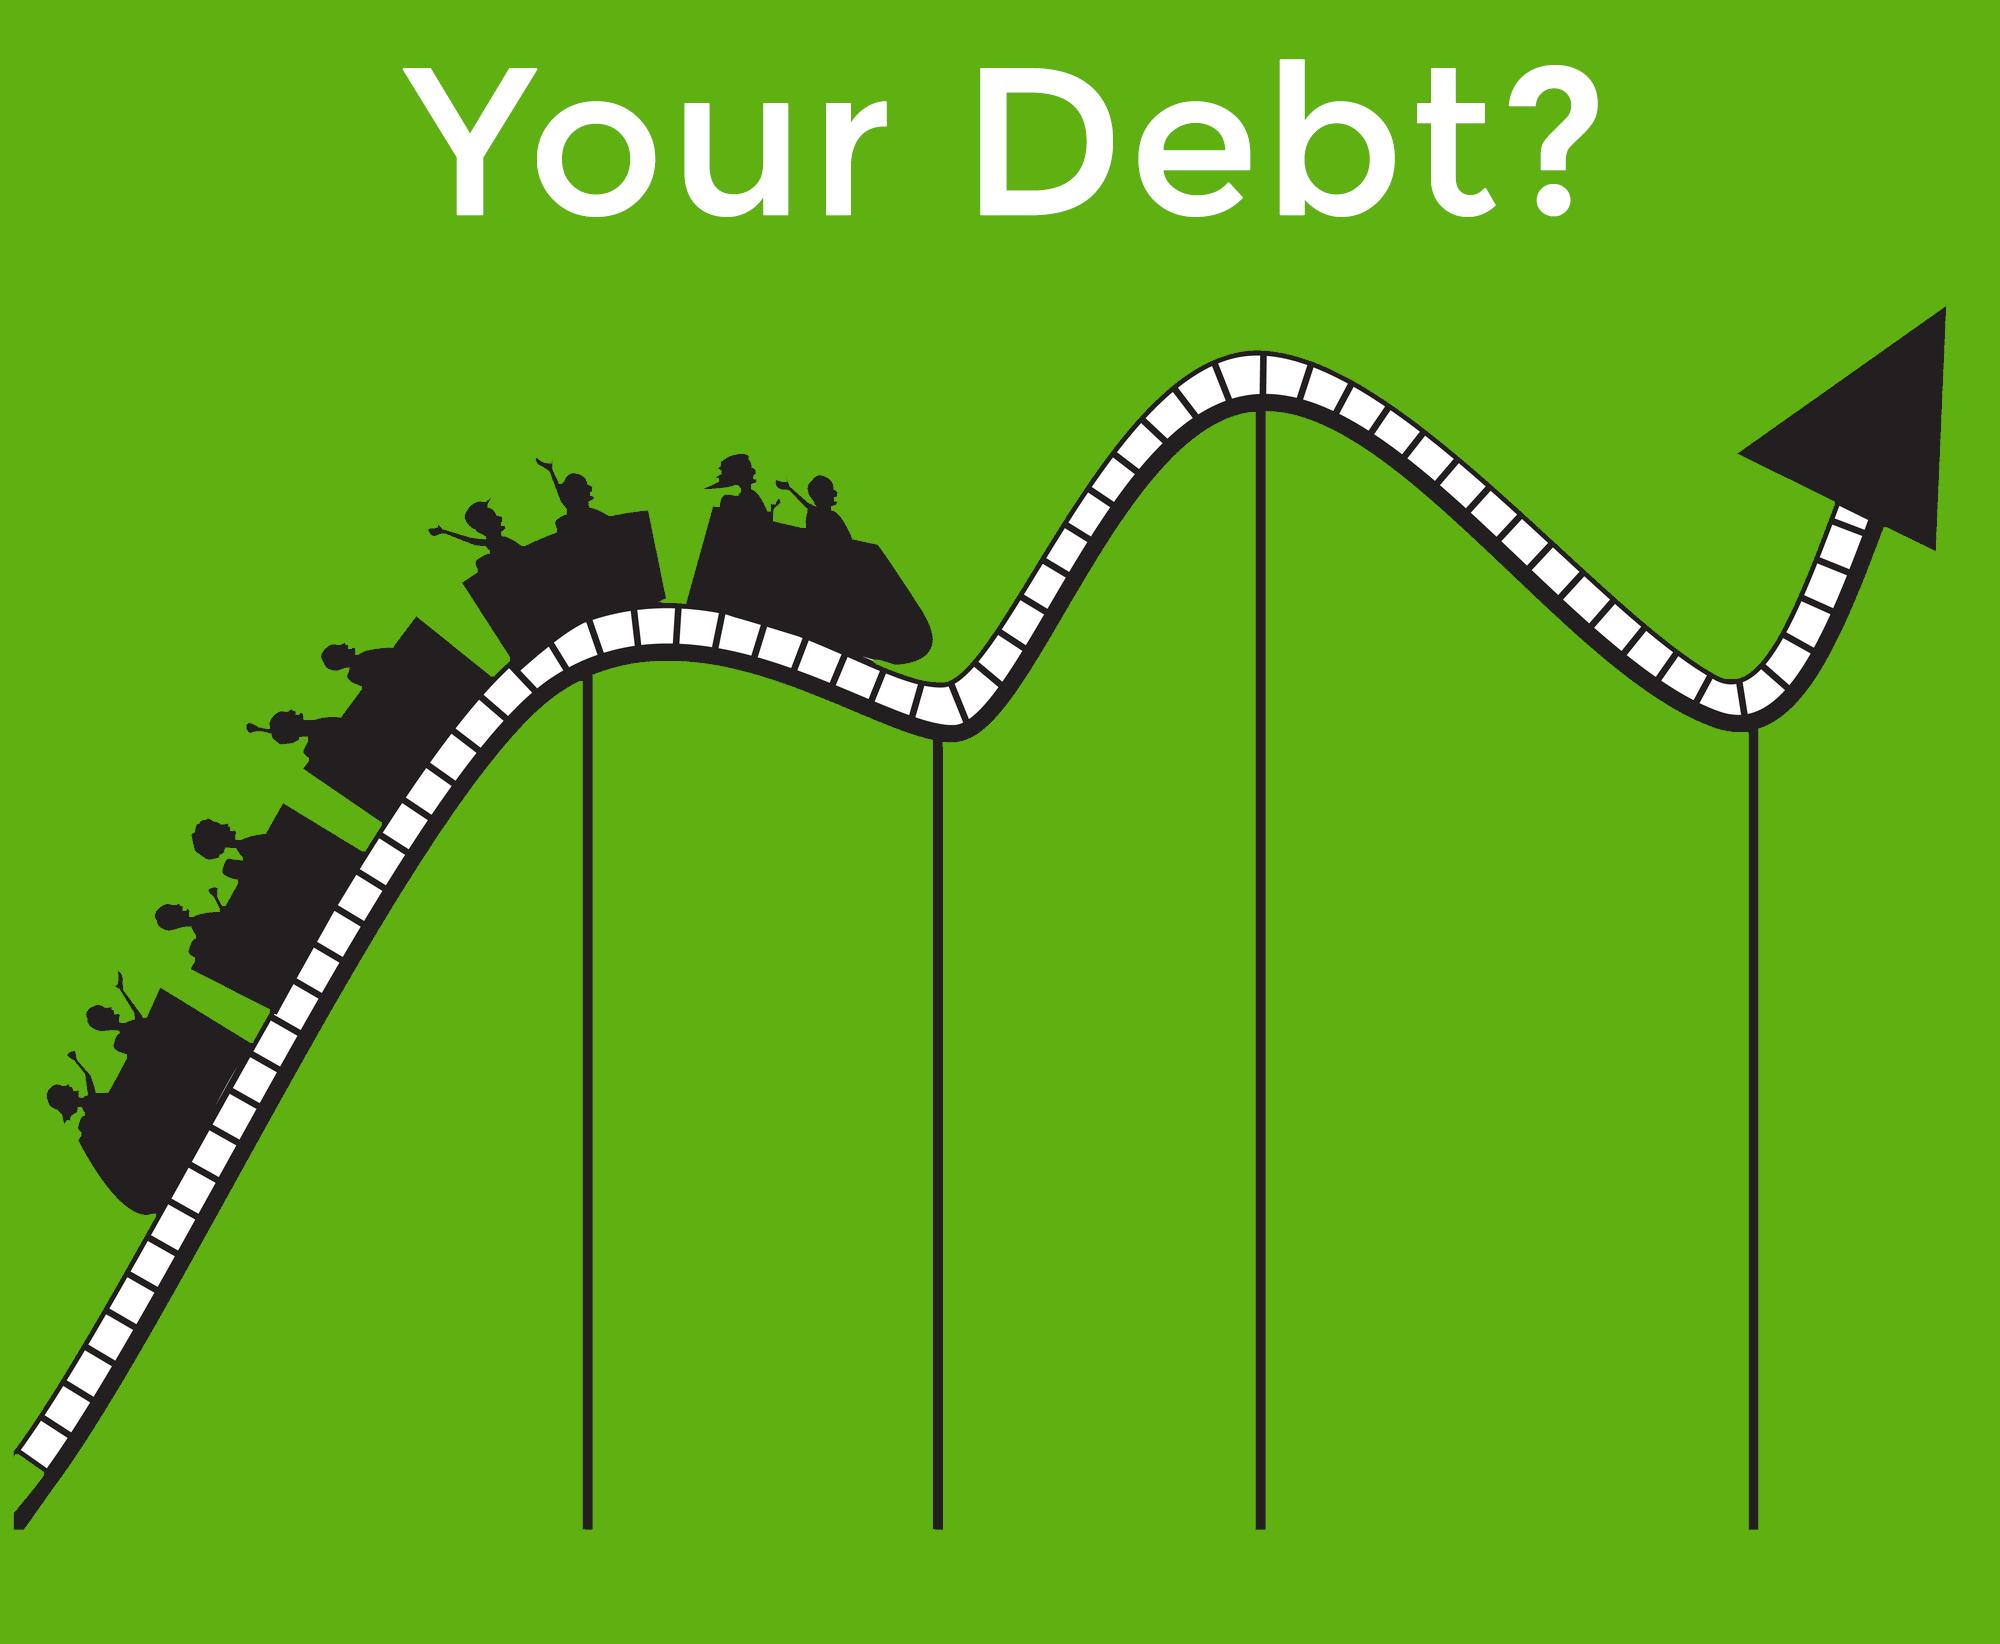 Debt Roller Coaster